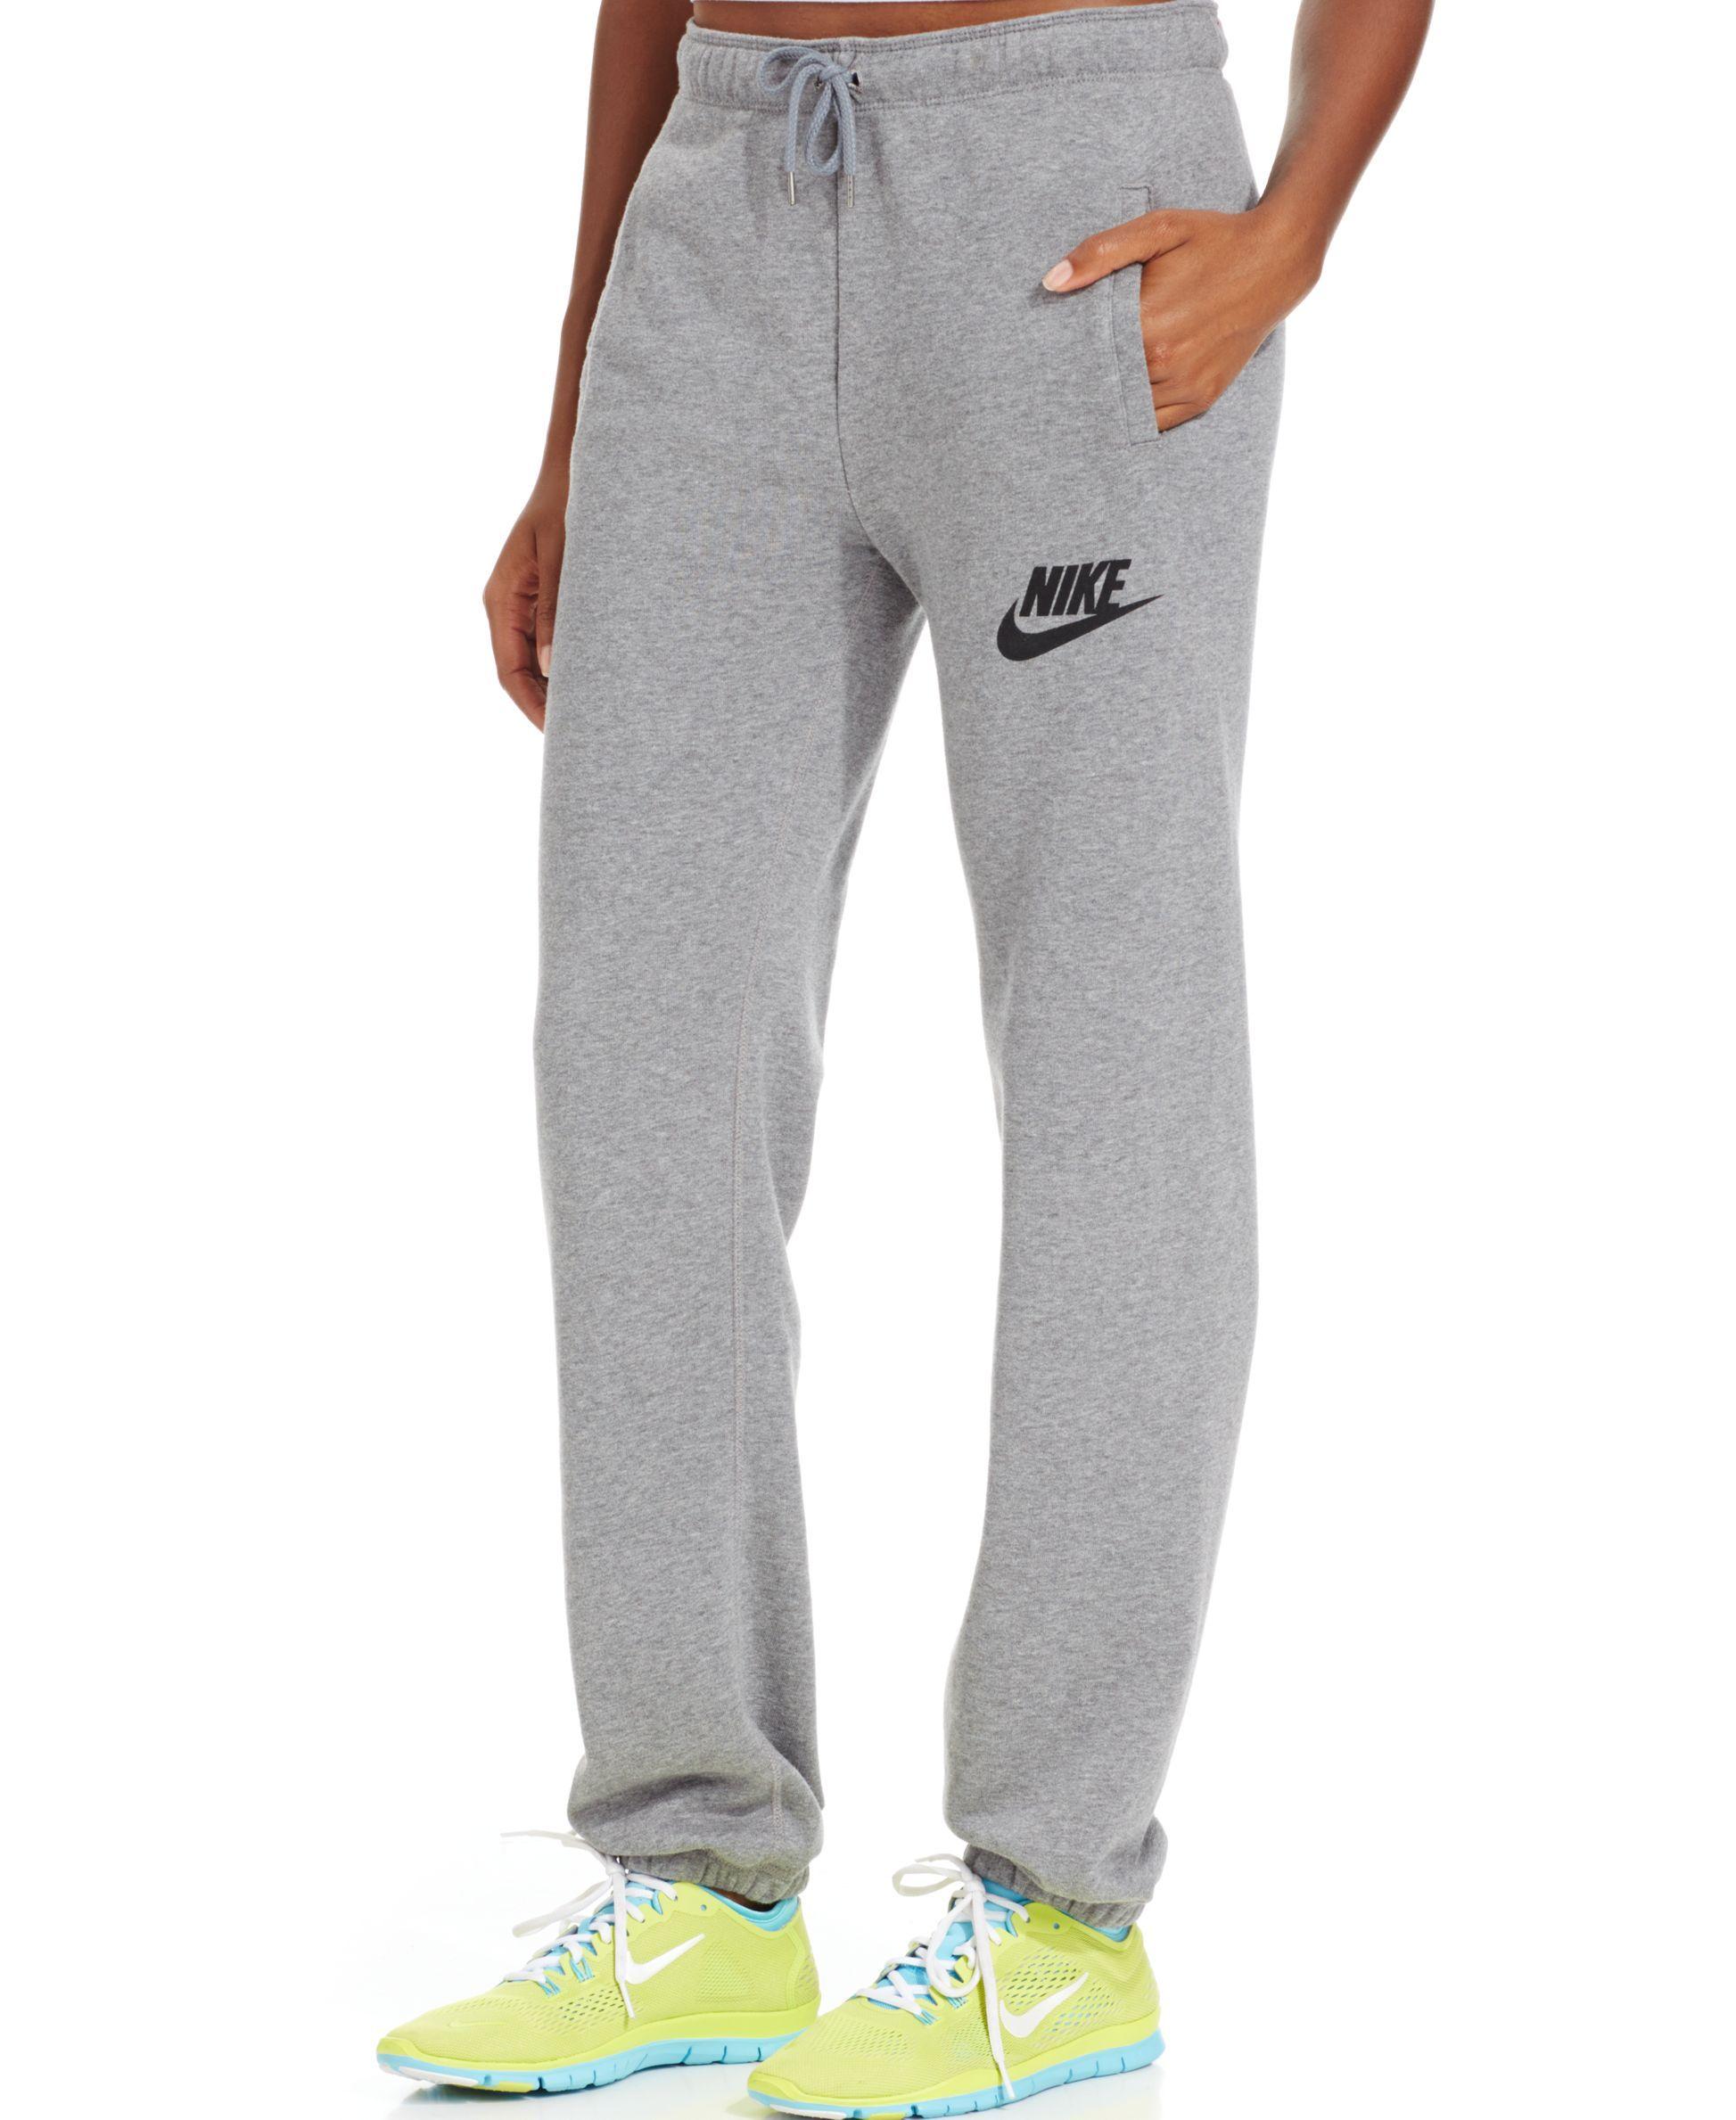 5b651bc9d72b Nike Rally Jogger Pants